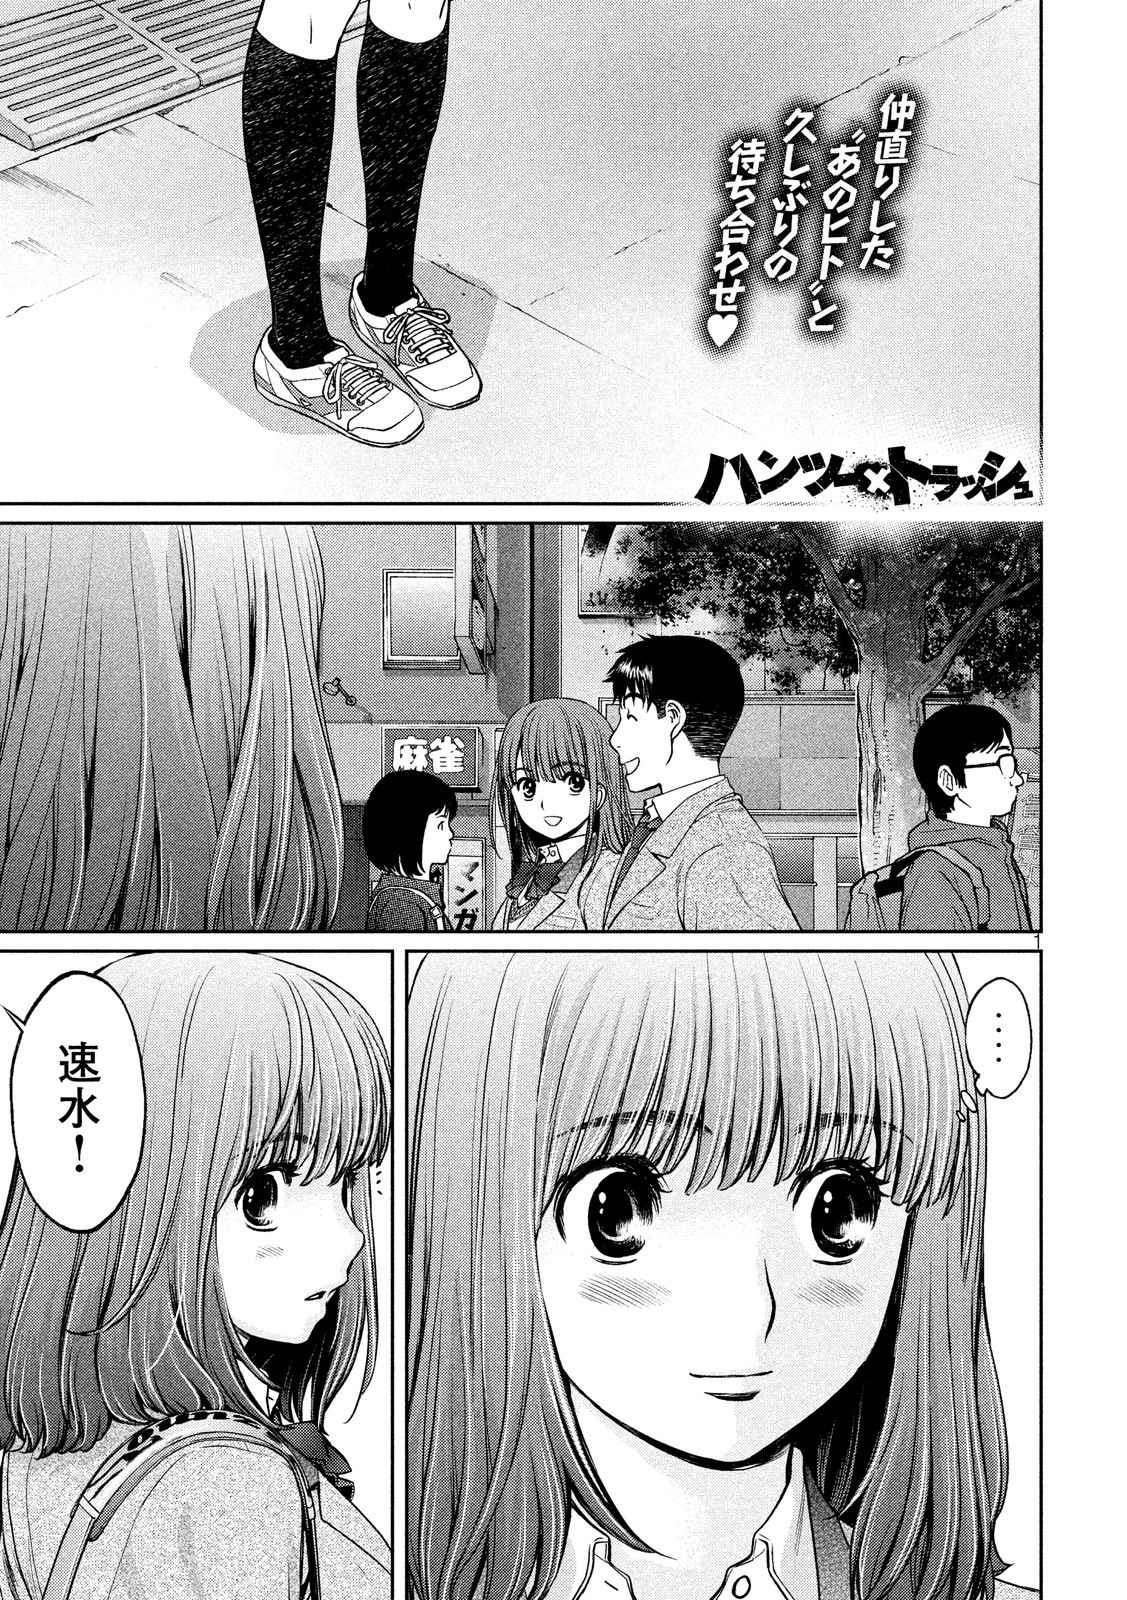 Hantsu x Trash - Chapter 118 - Page 1